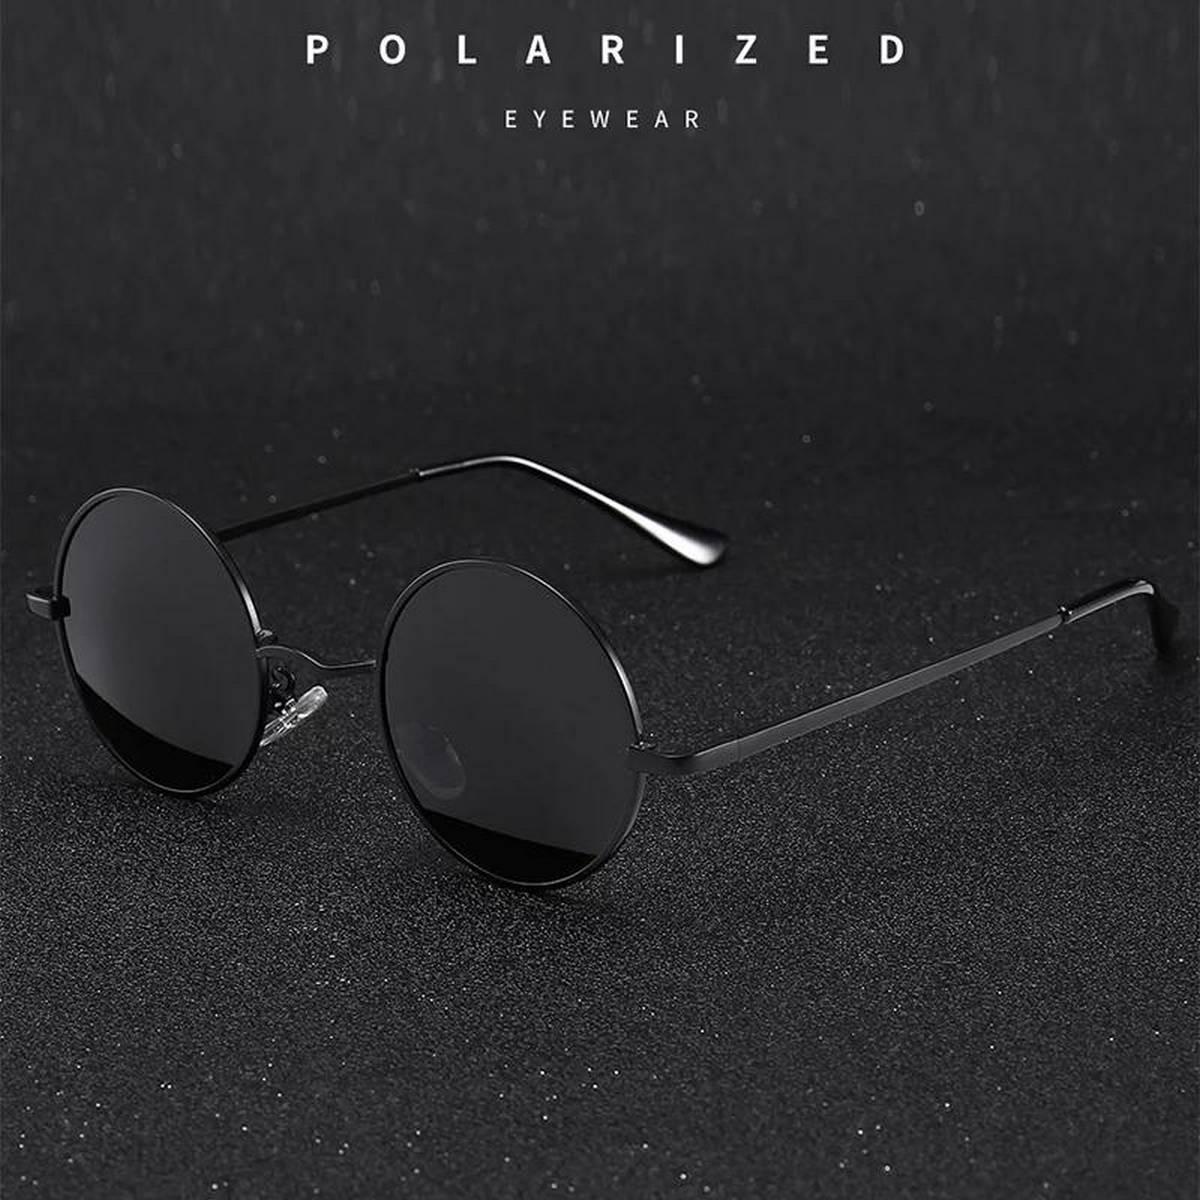 Sunglasses Polarized Lens Vintage Eyewear Accessories Sun Glasses For Men